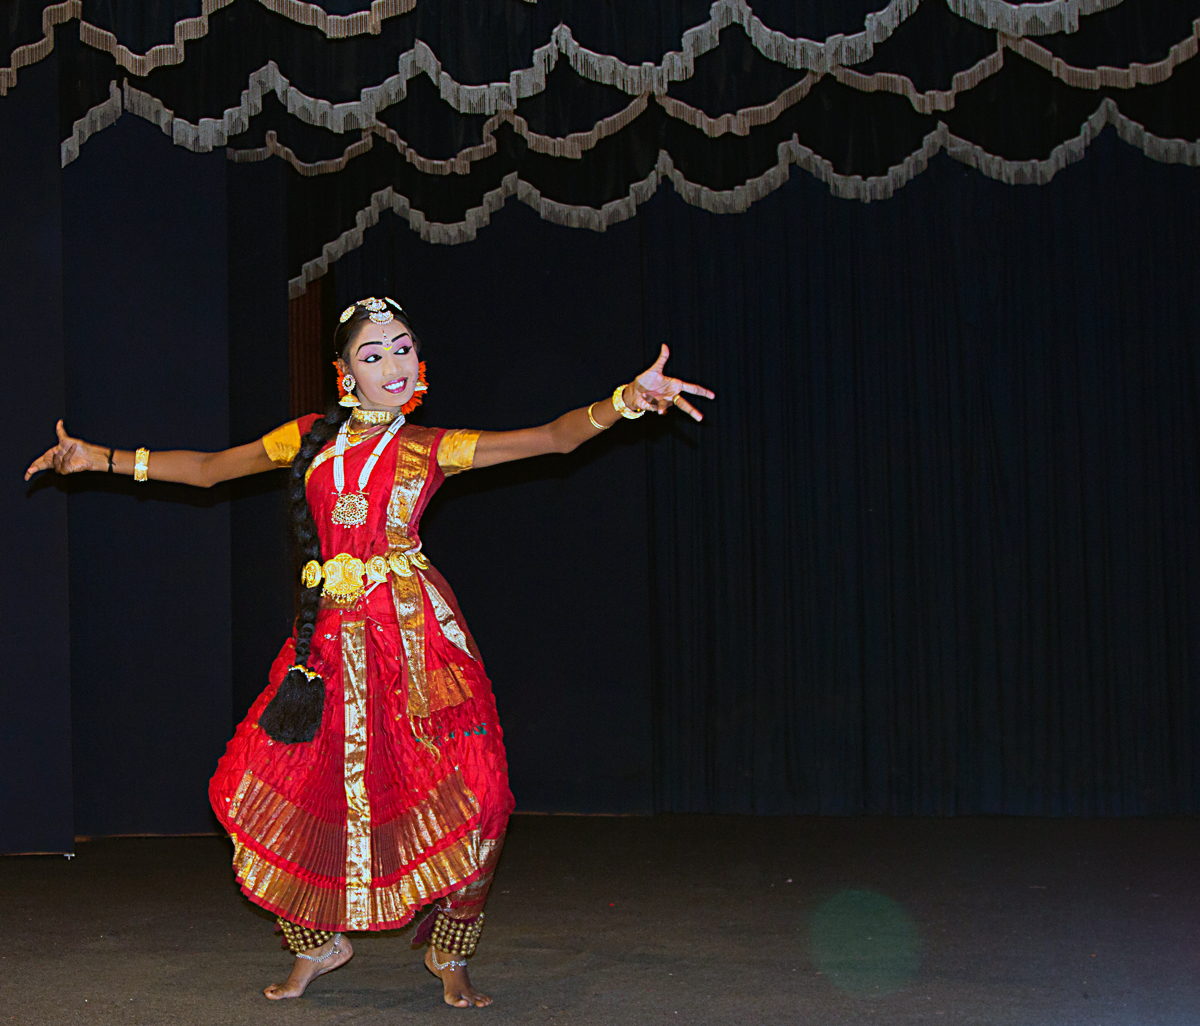 INDIEN Cochin Kerala Menschen Masken FINEST-onTour 9021.jpg